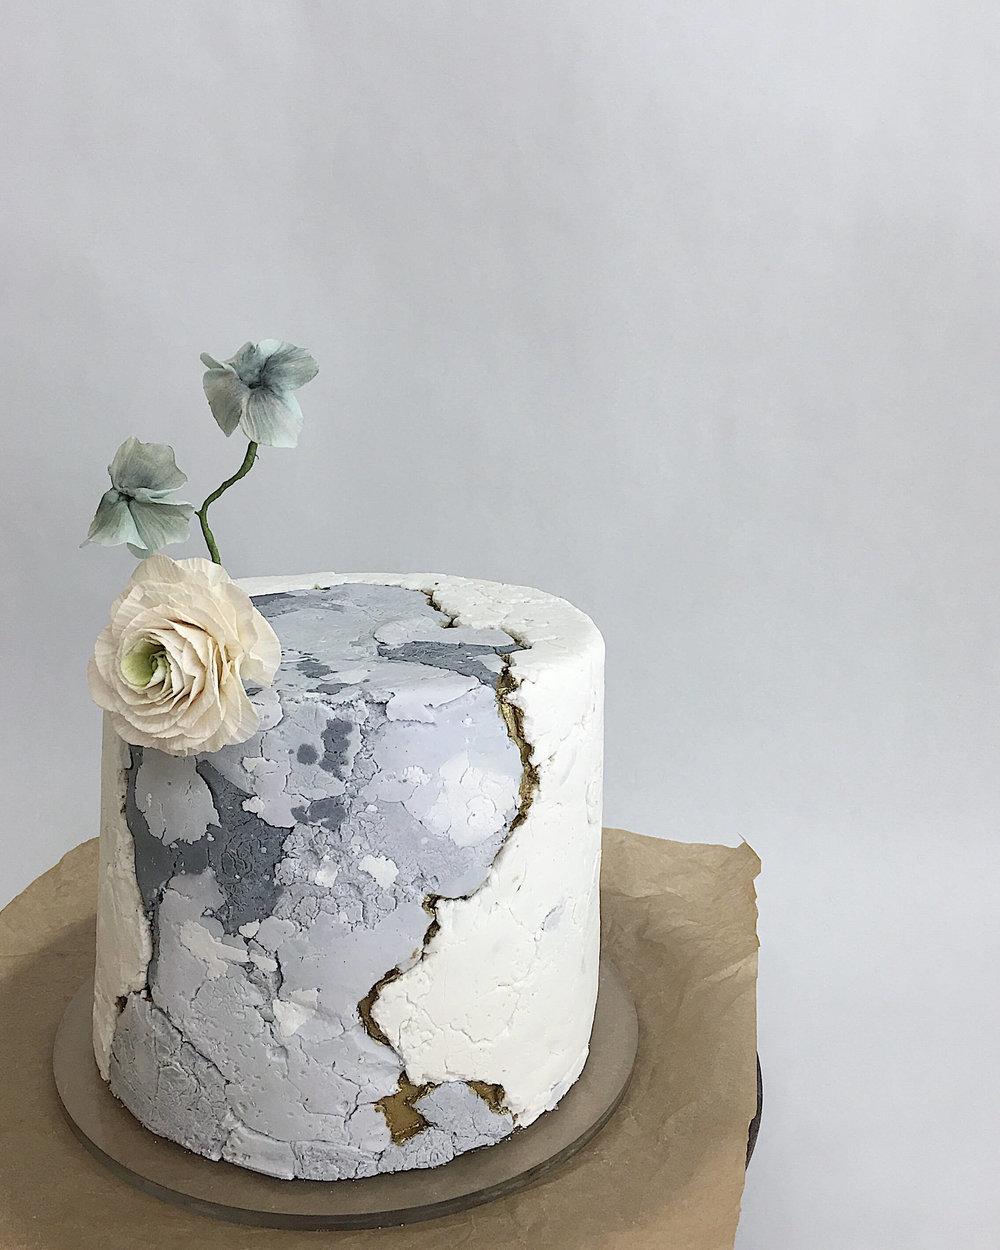 kintsugi aged stone fondant texture cake.jpg